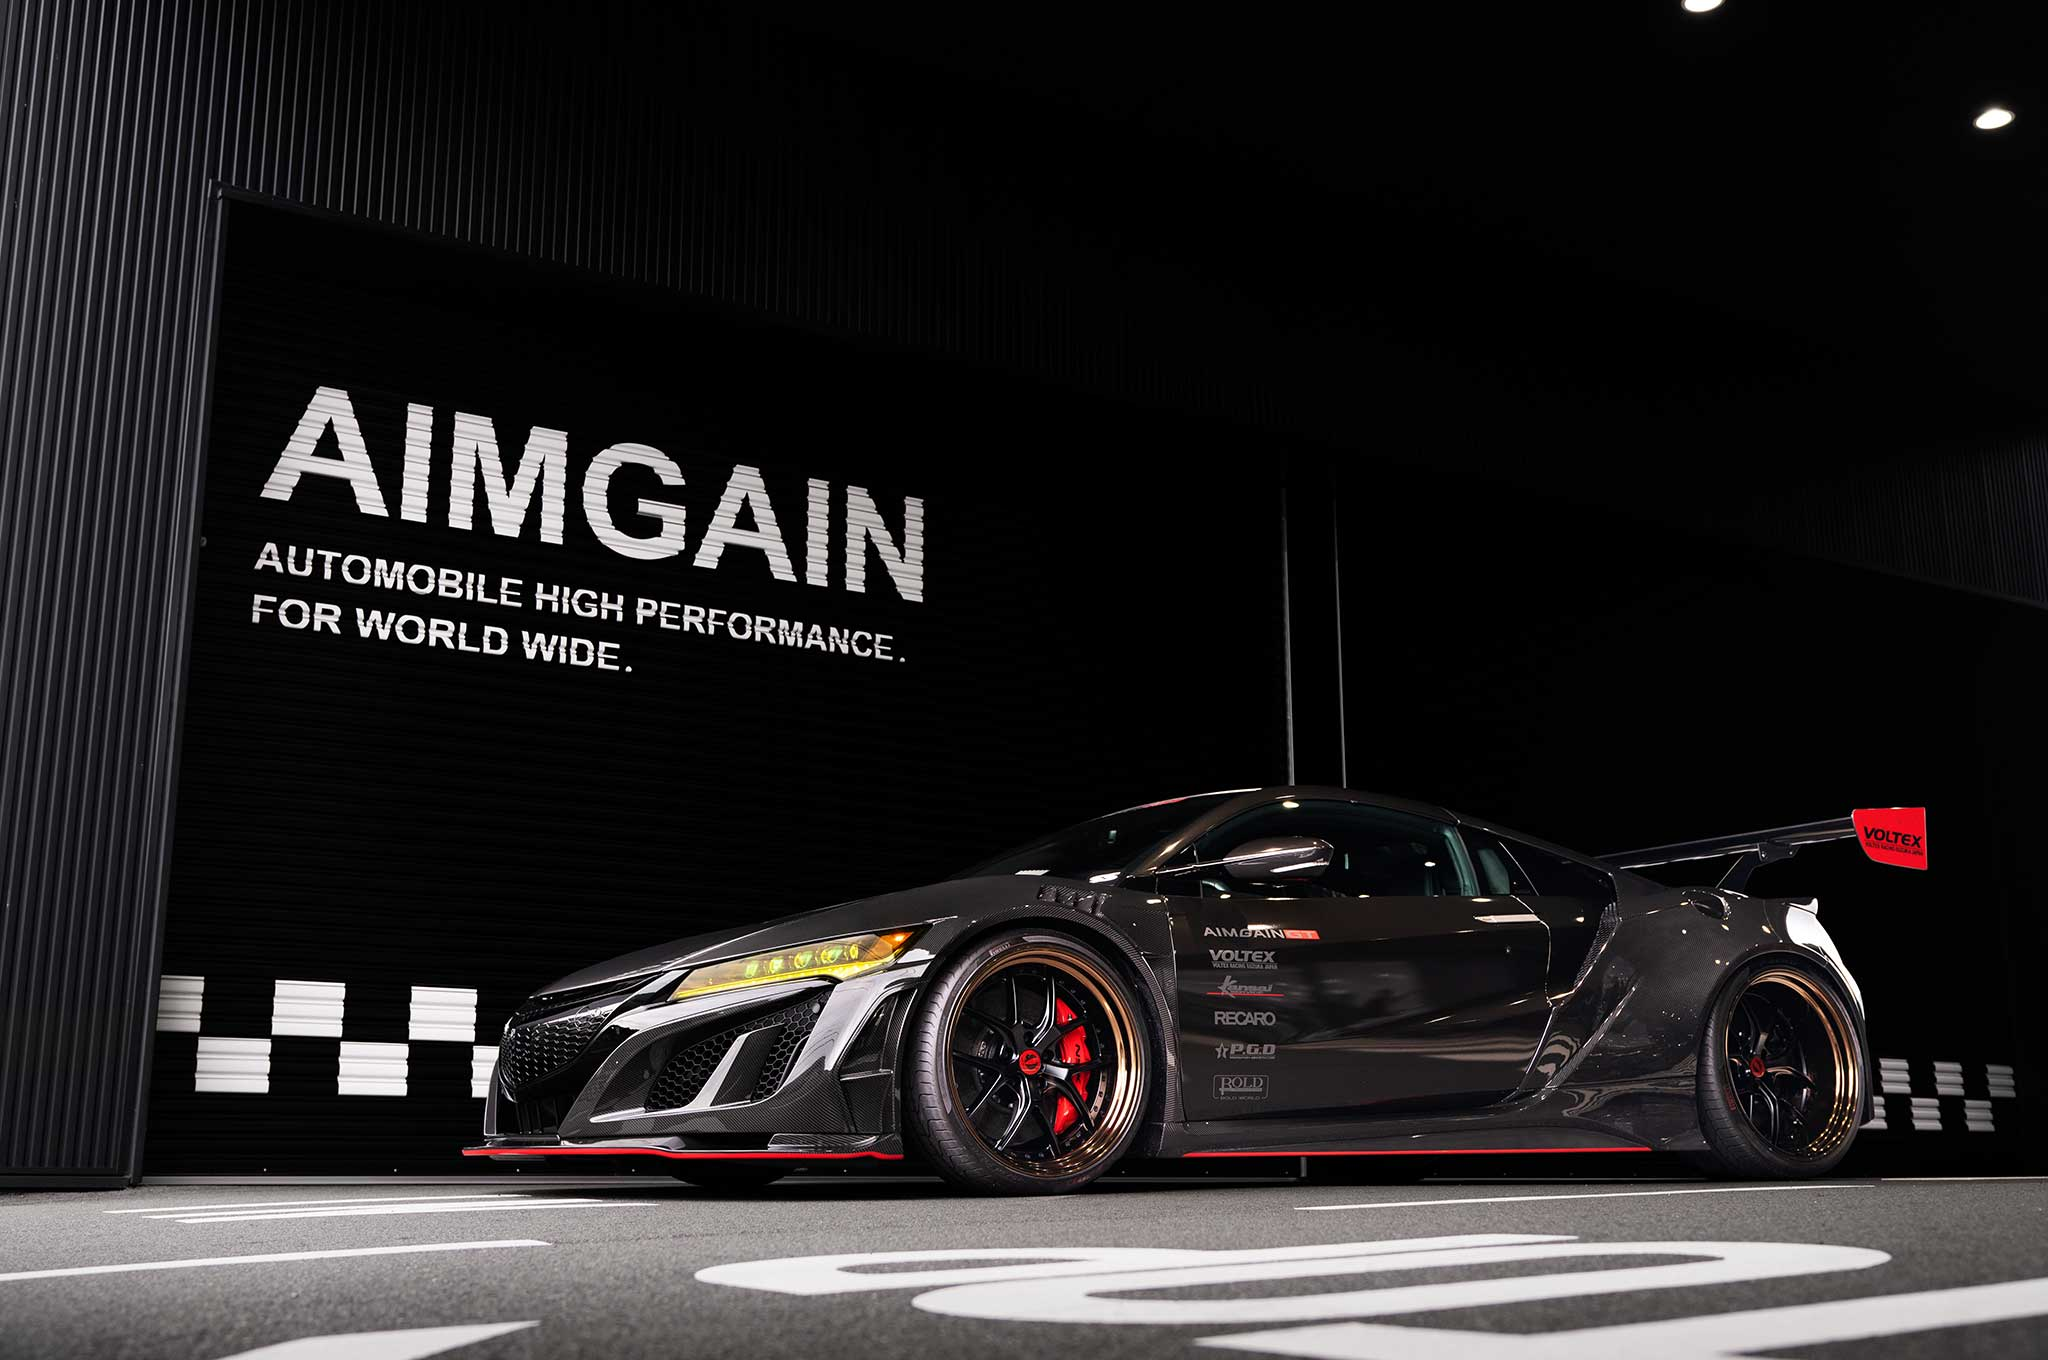 [Image: 2018-Acura-NSX-AIMGAIN-Widebody-Kit.jpg]